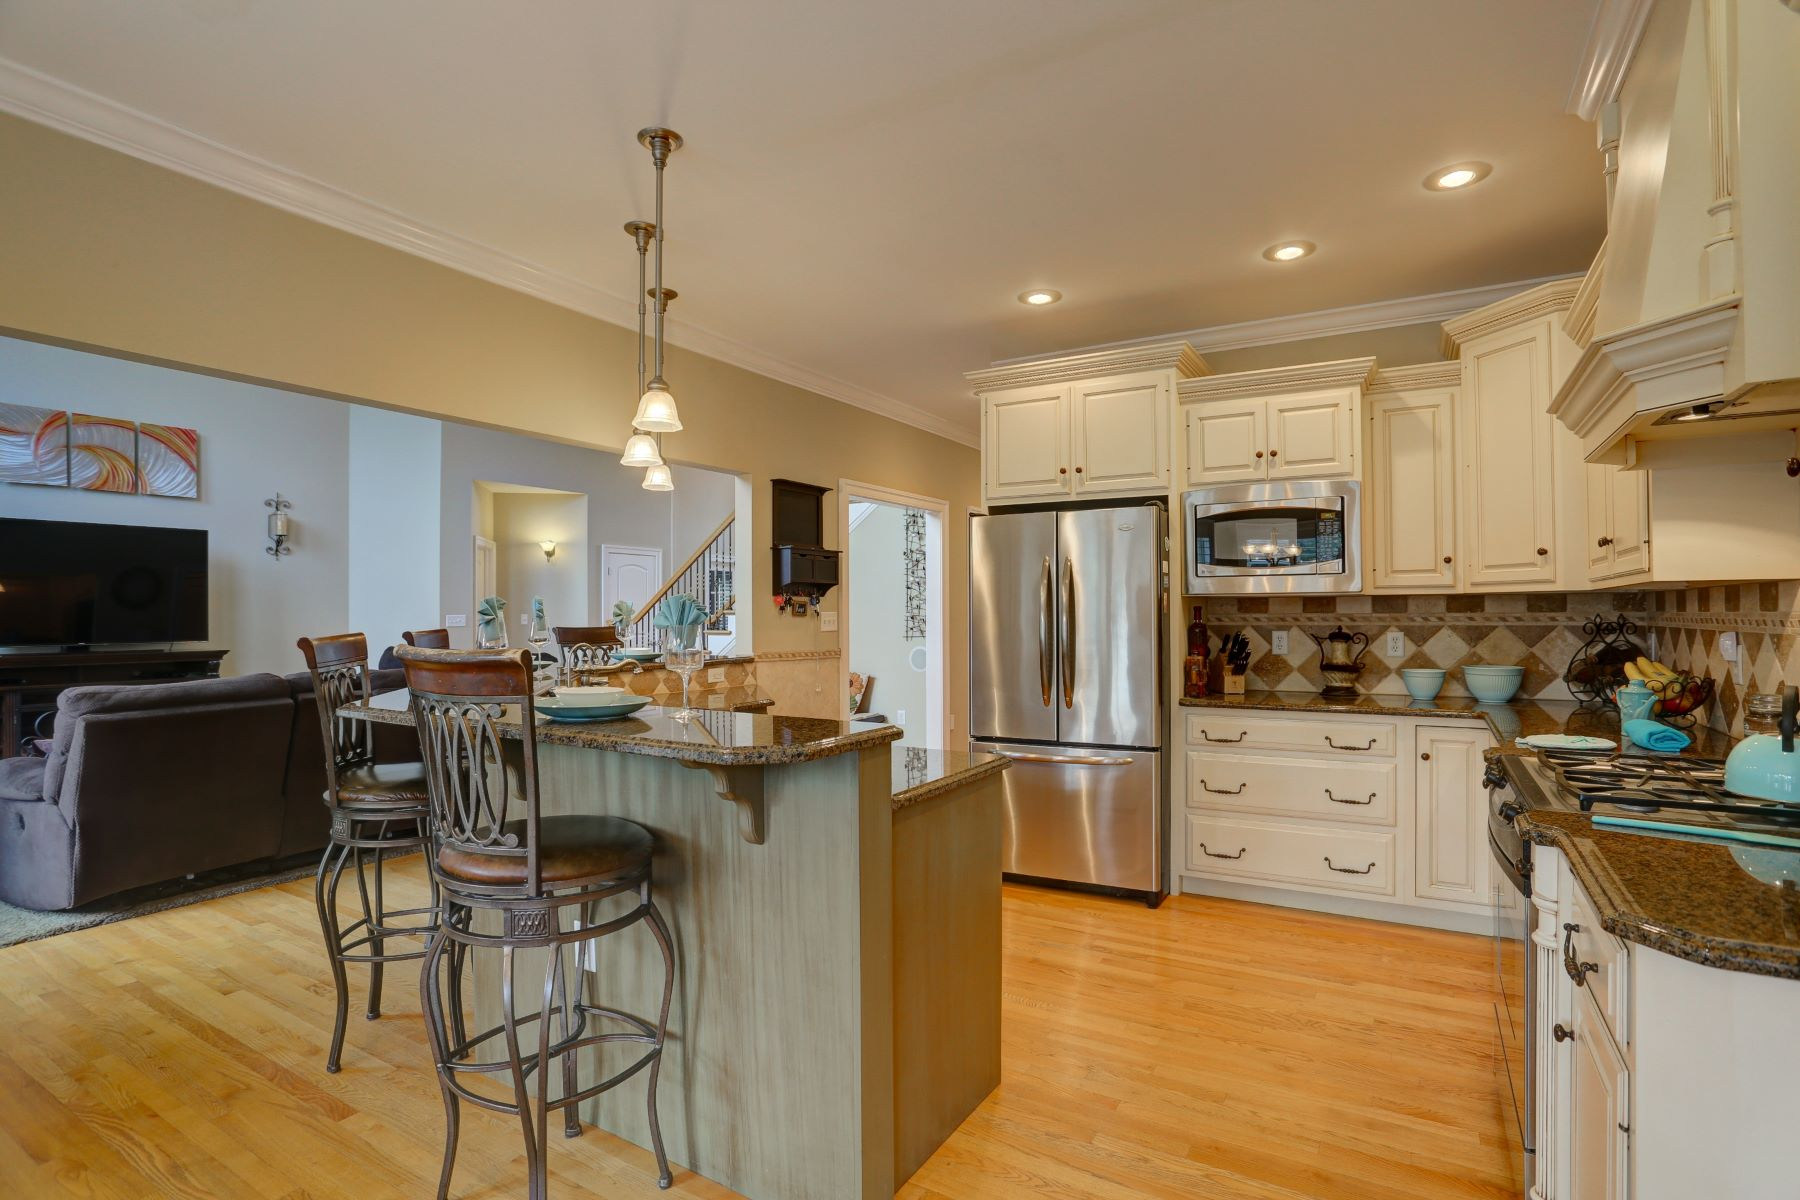 Additional photo for property listing at 1125 N Bristol Drive 1125 N Bristol Drive Lititz, Pennsylvania 17543 United States